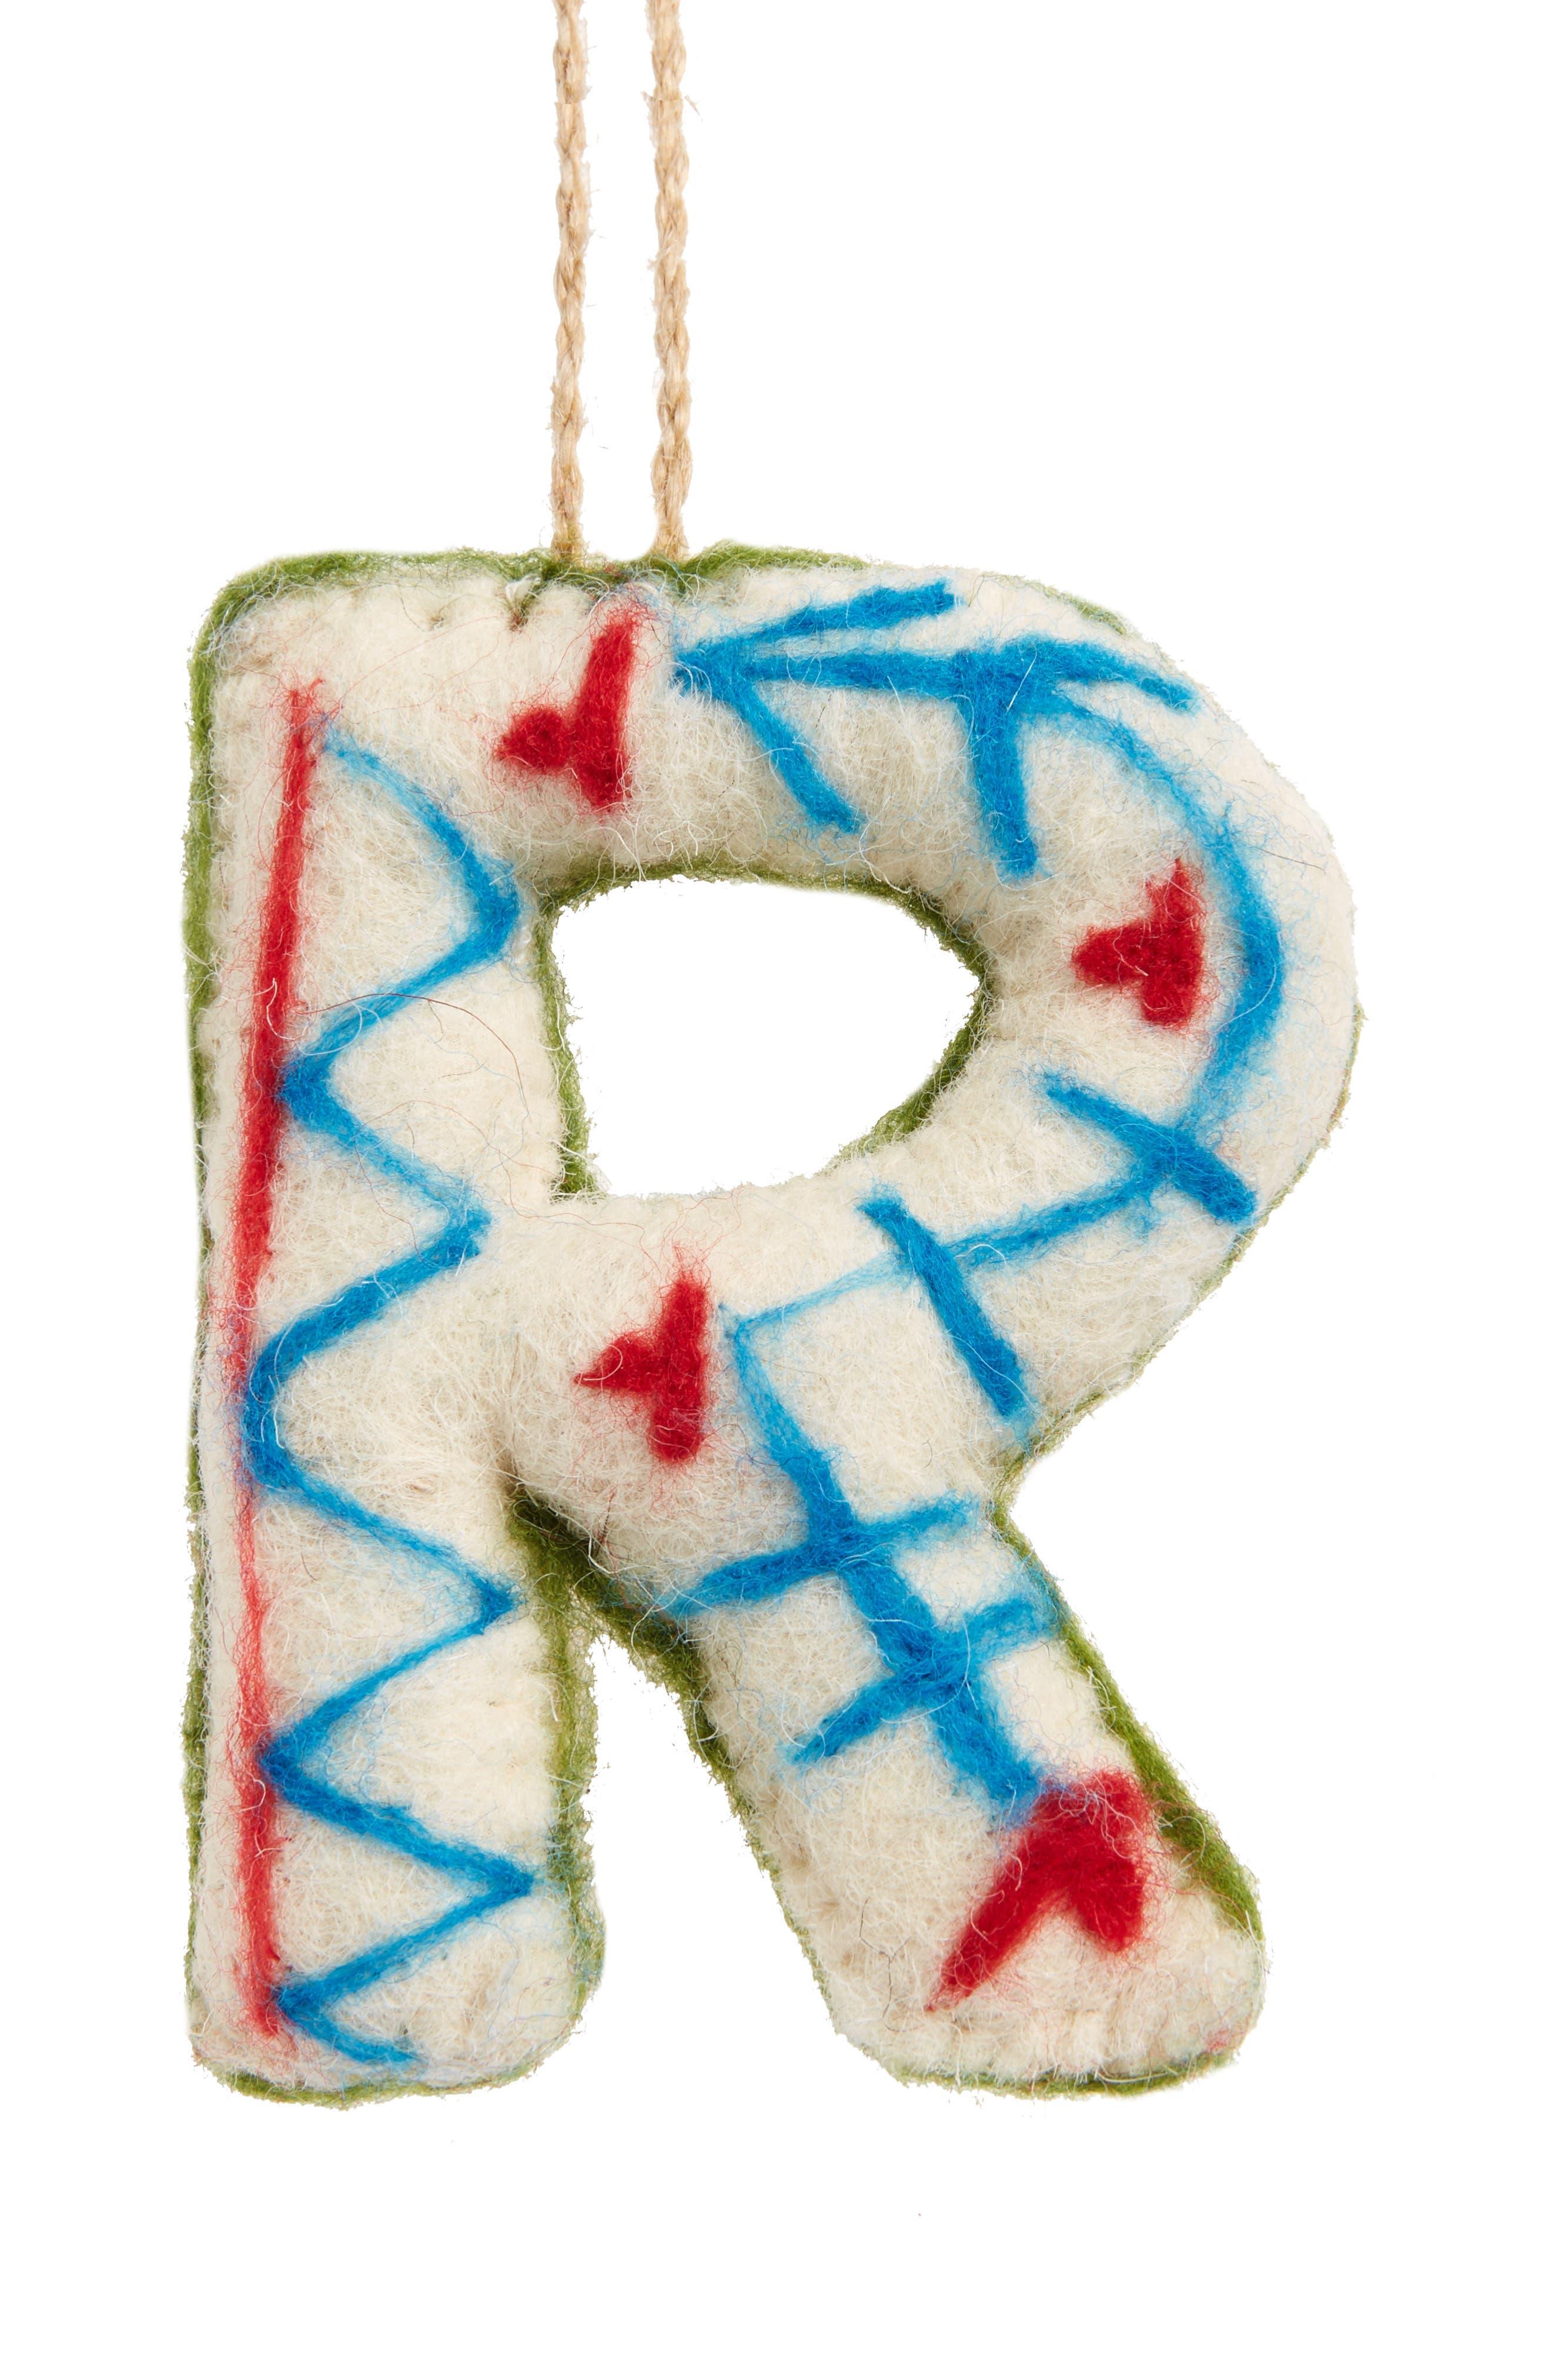 Nordstrom at Home Global Folk Wool Monogram Ornament